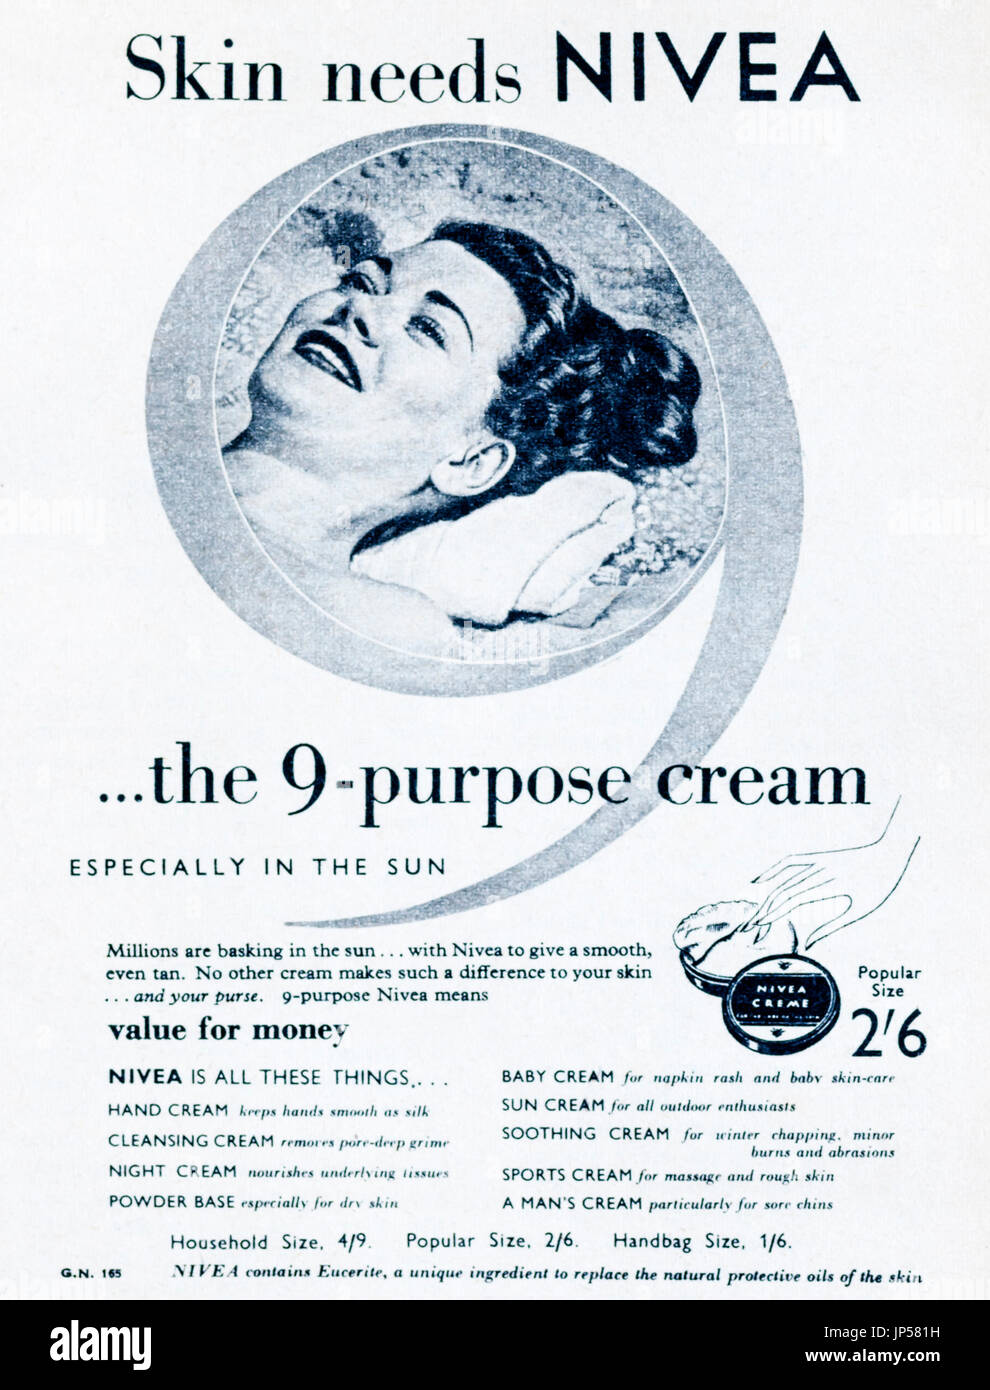 1950s magazine advertisement advertising Nivea face cream - Stock Image